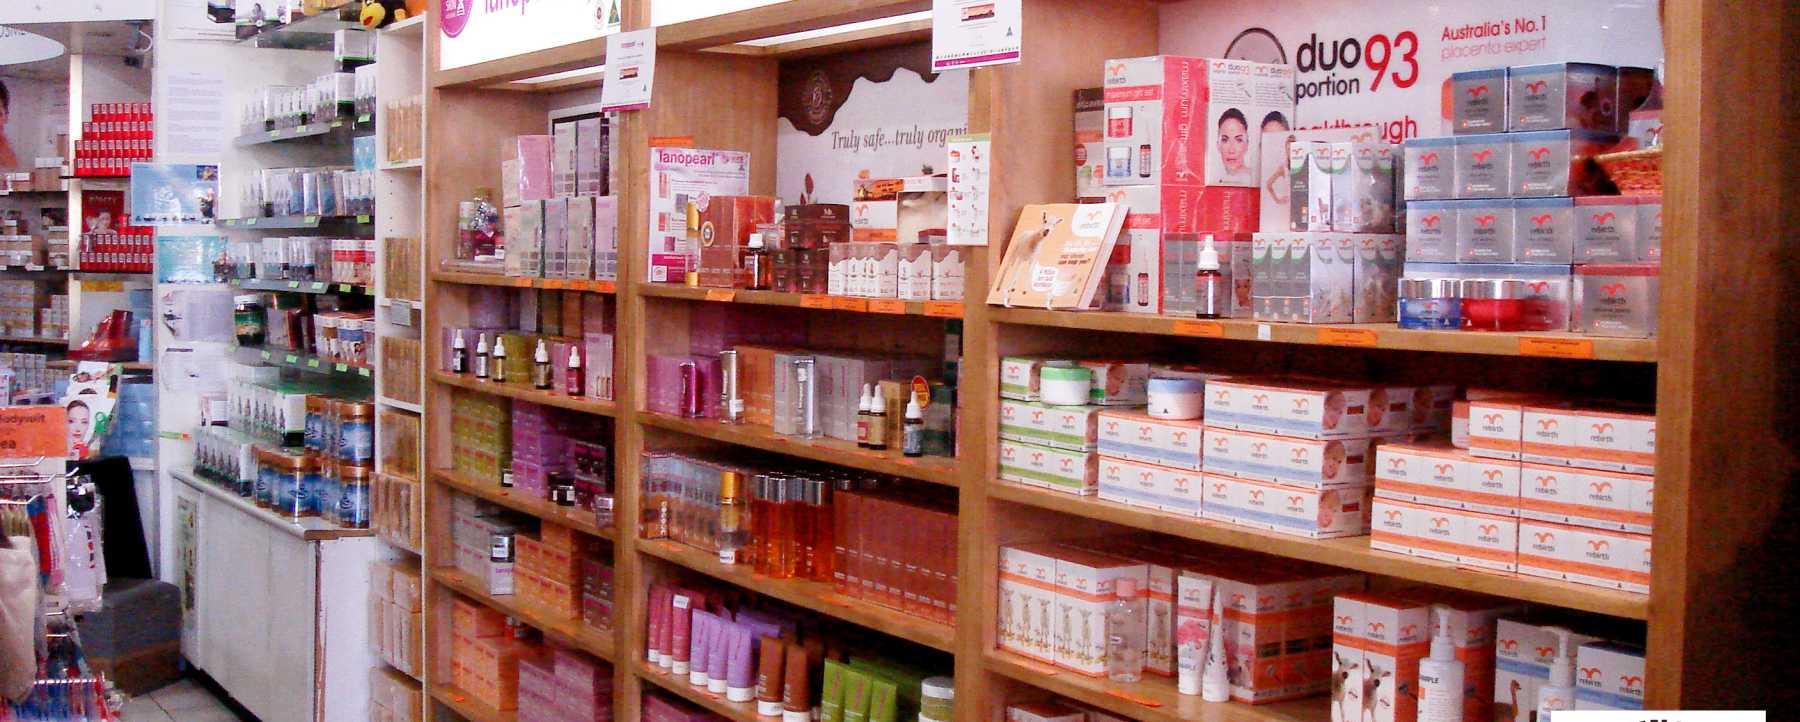 Australian brand skin-care